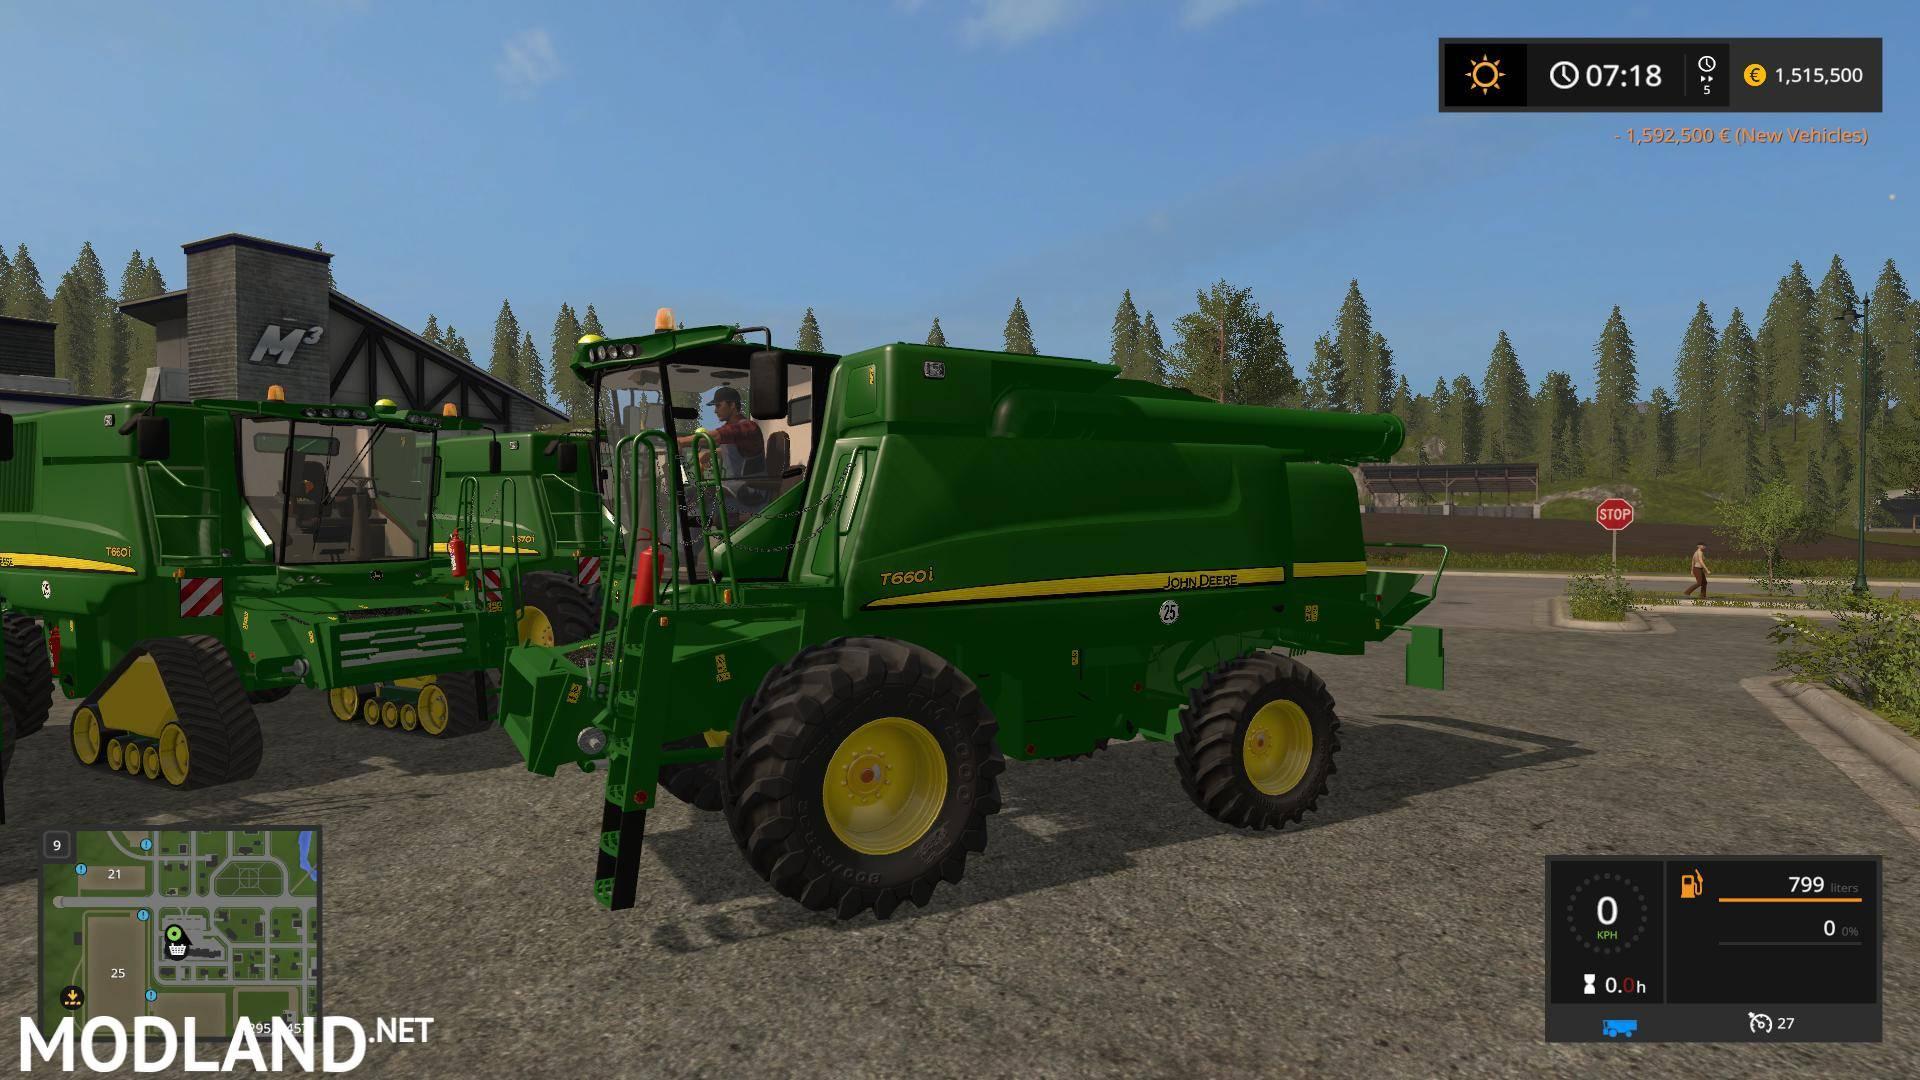 John Deere T660i/T670i Dynamichose Final mod Farming Simulator 17